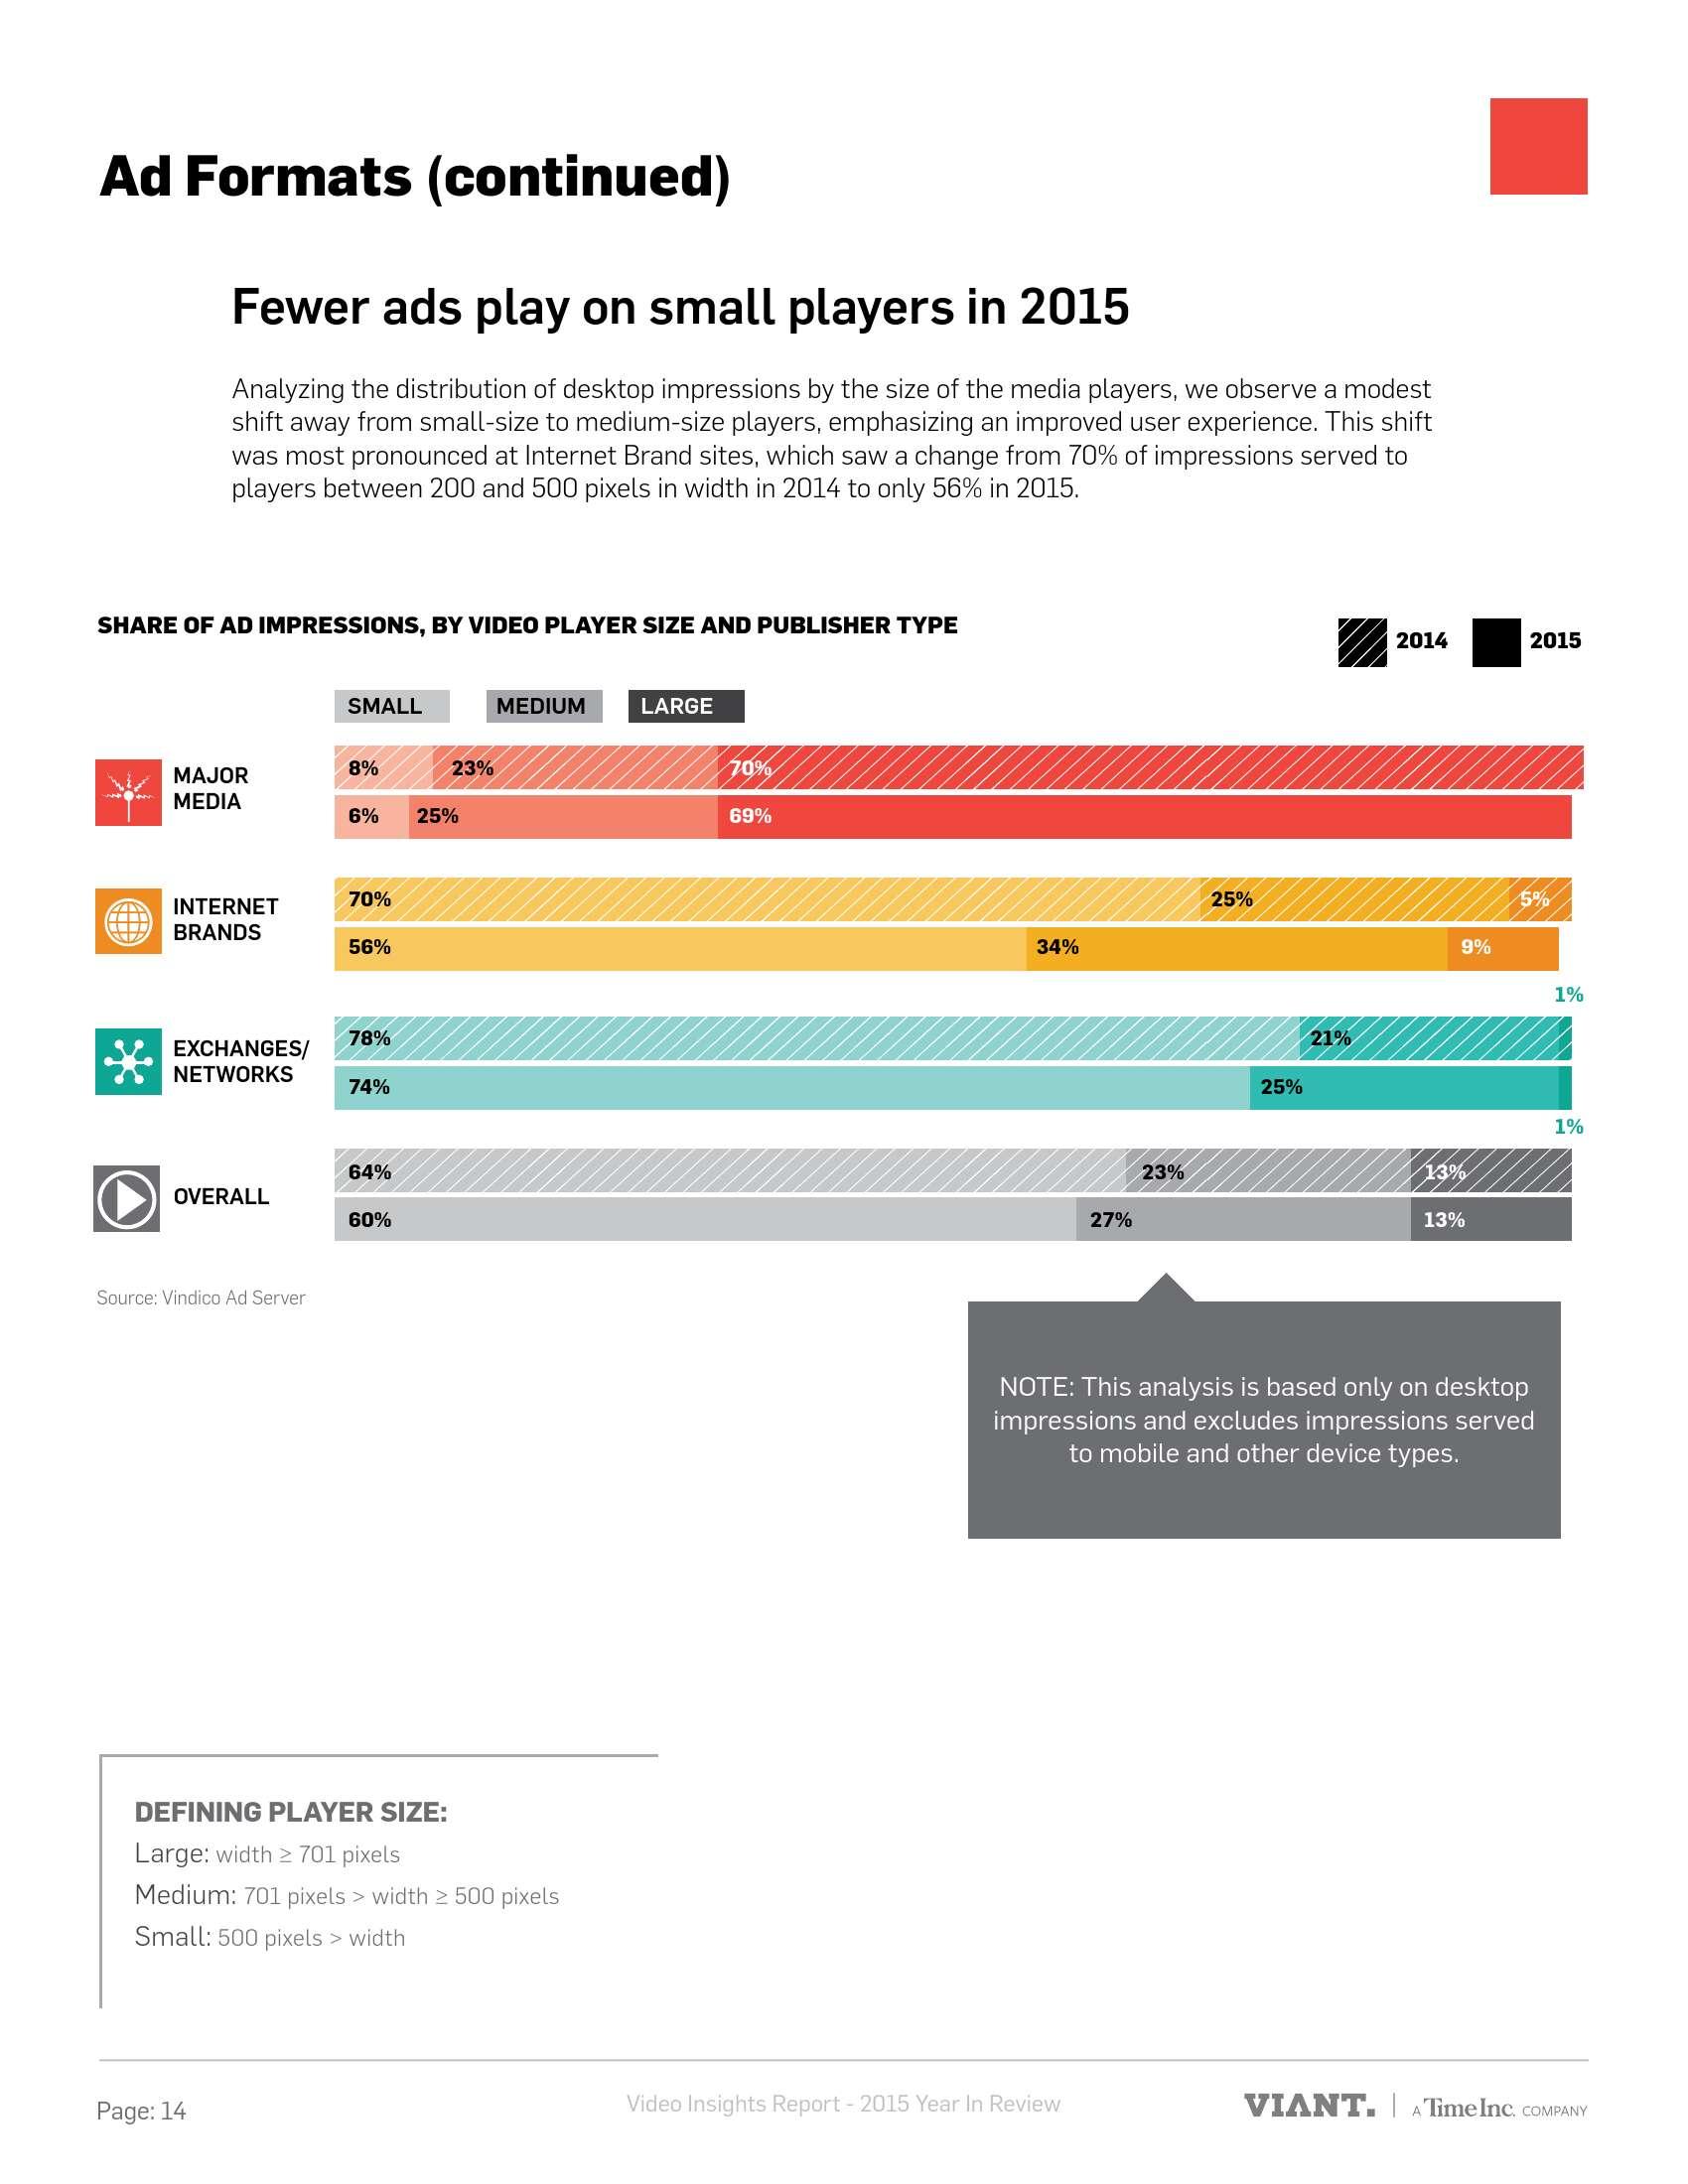 Viant:2015年视频广告趋势分析报告_000014